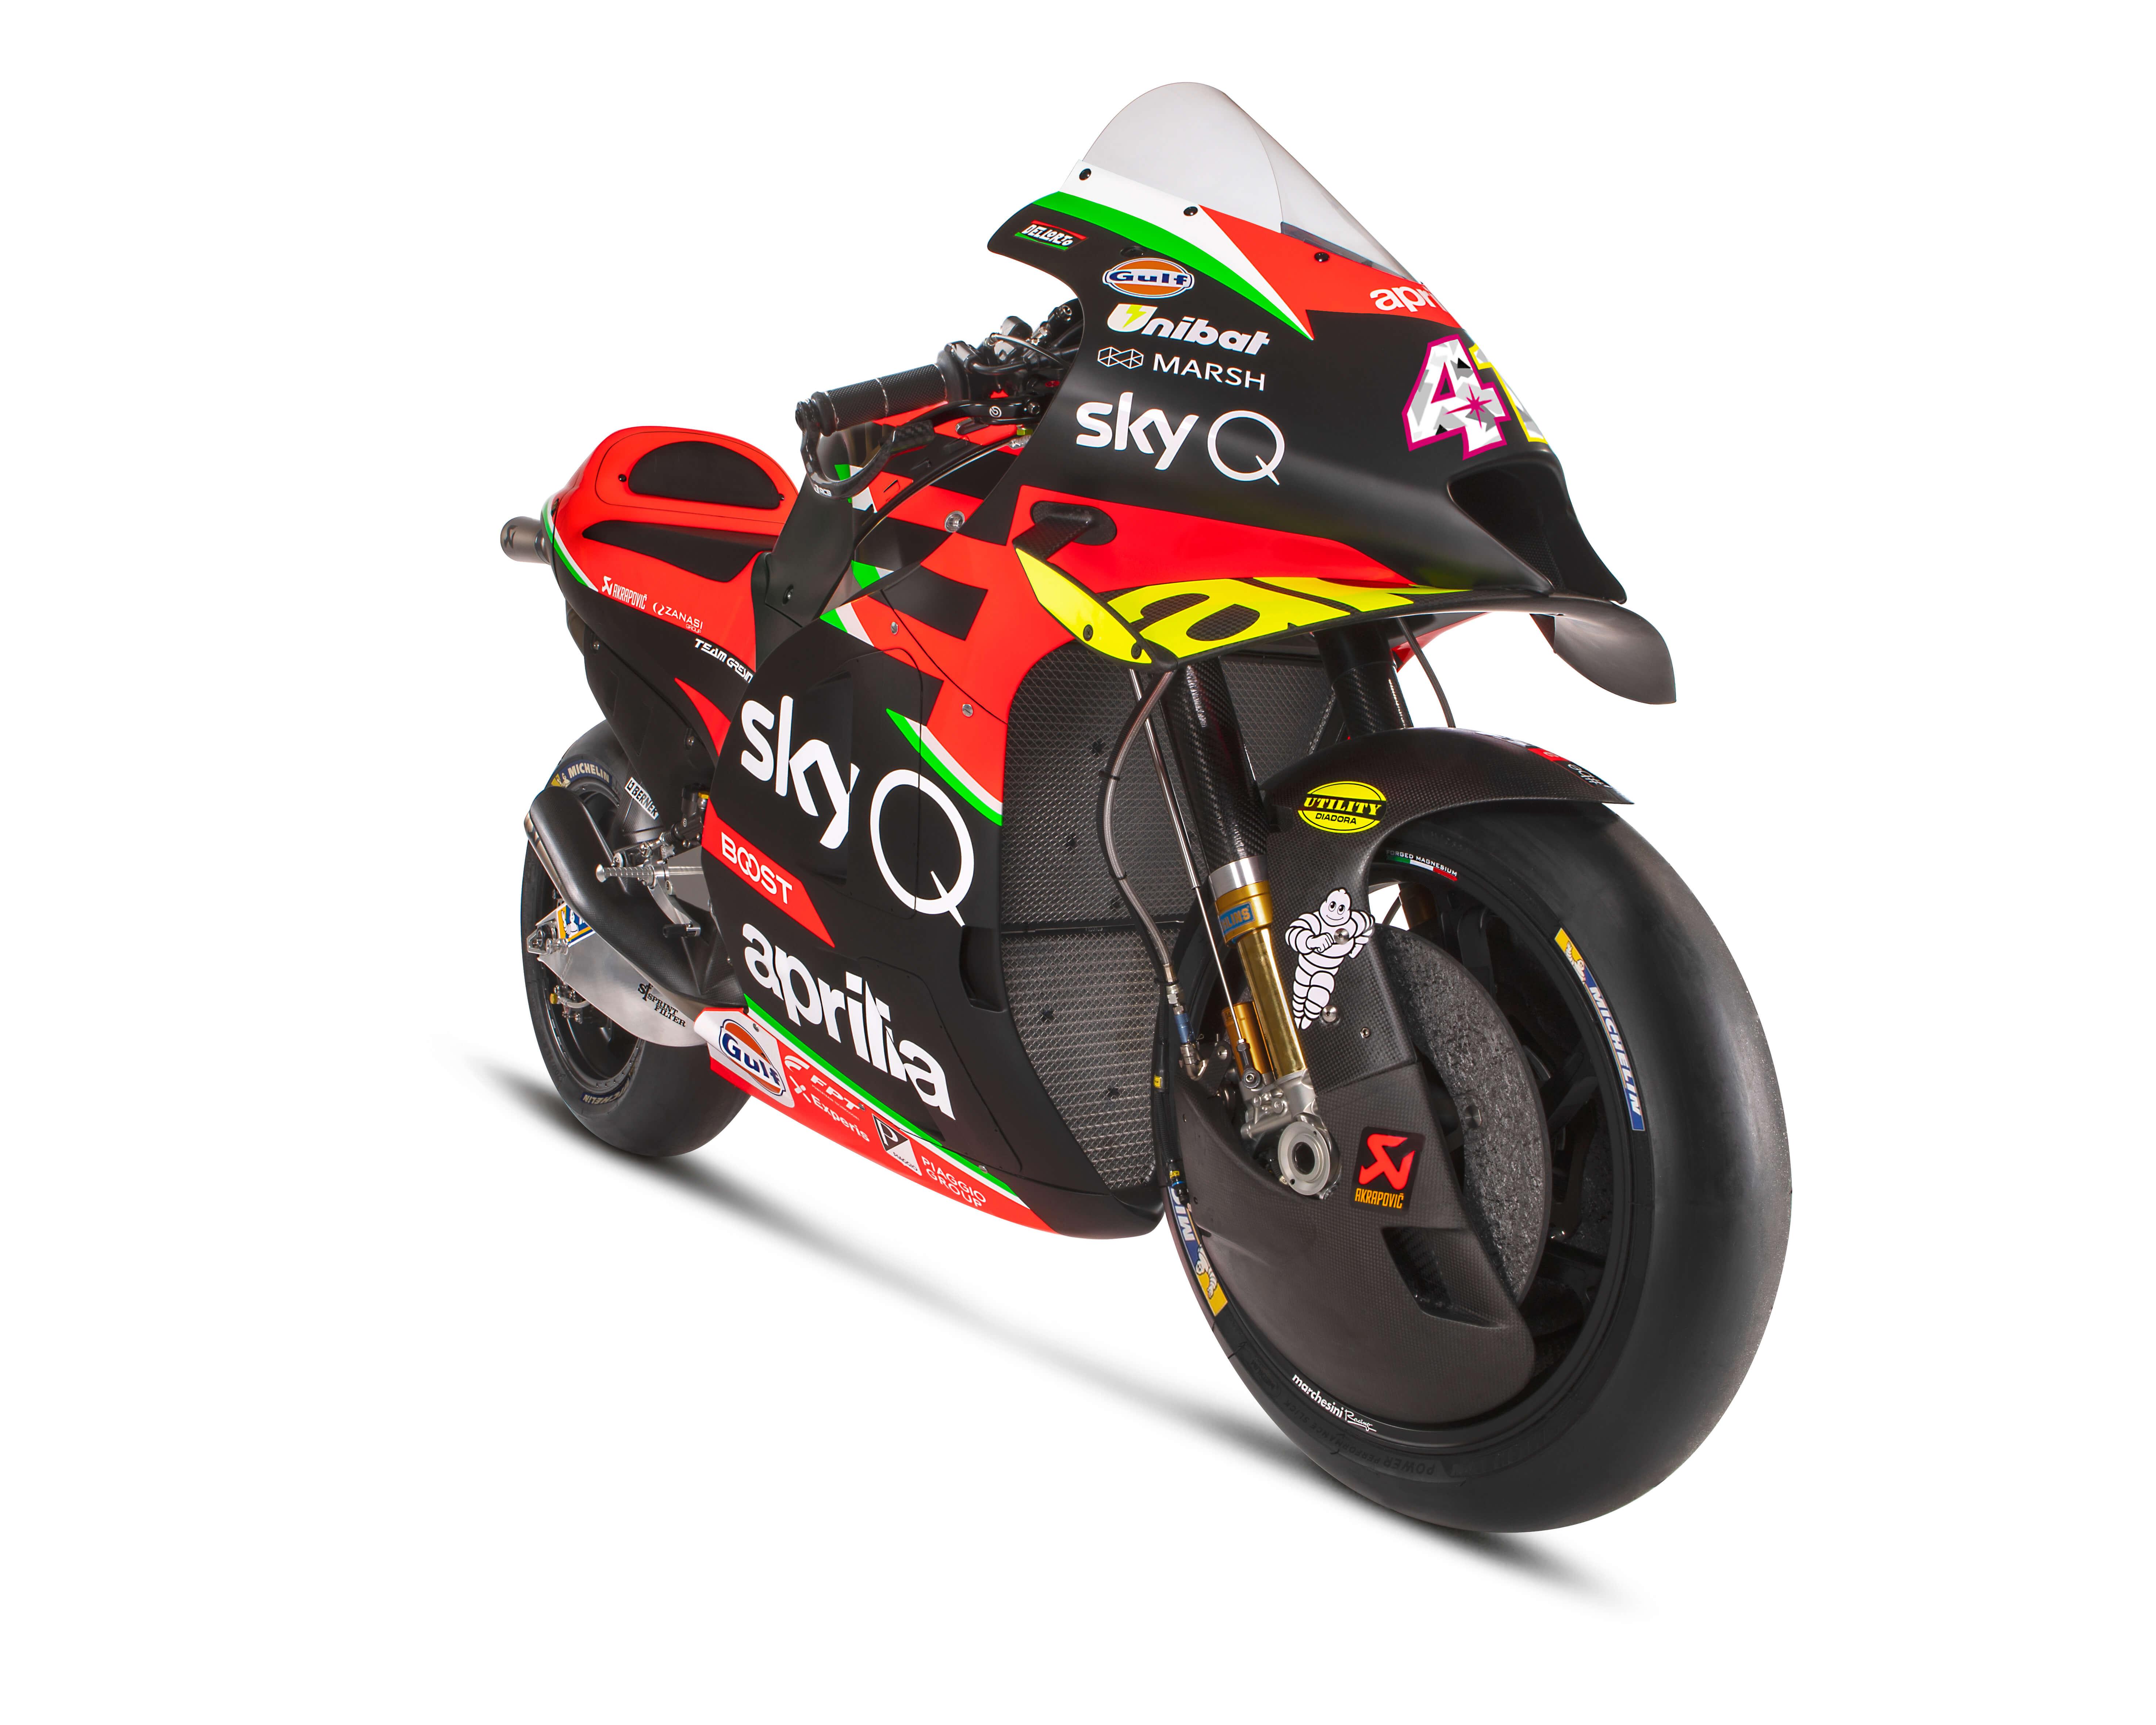 Aprilia RS-GP MotoGP Racebike Unveiled - Motorcycle.com News